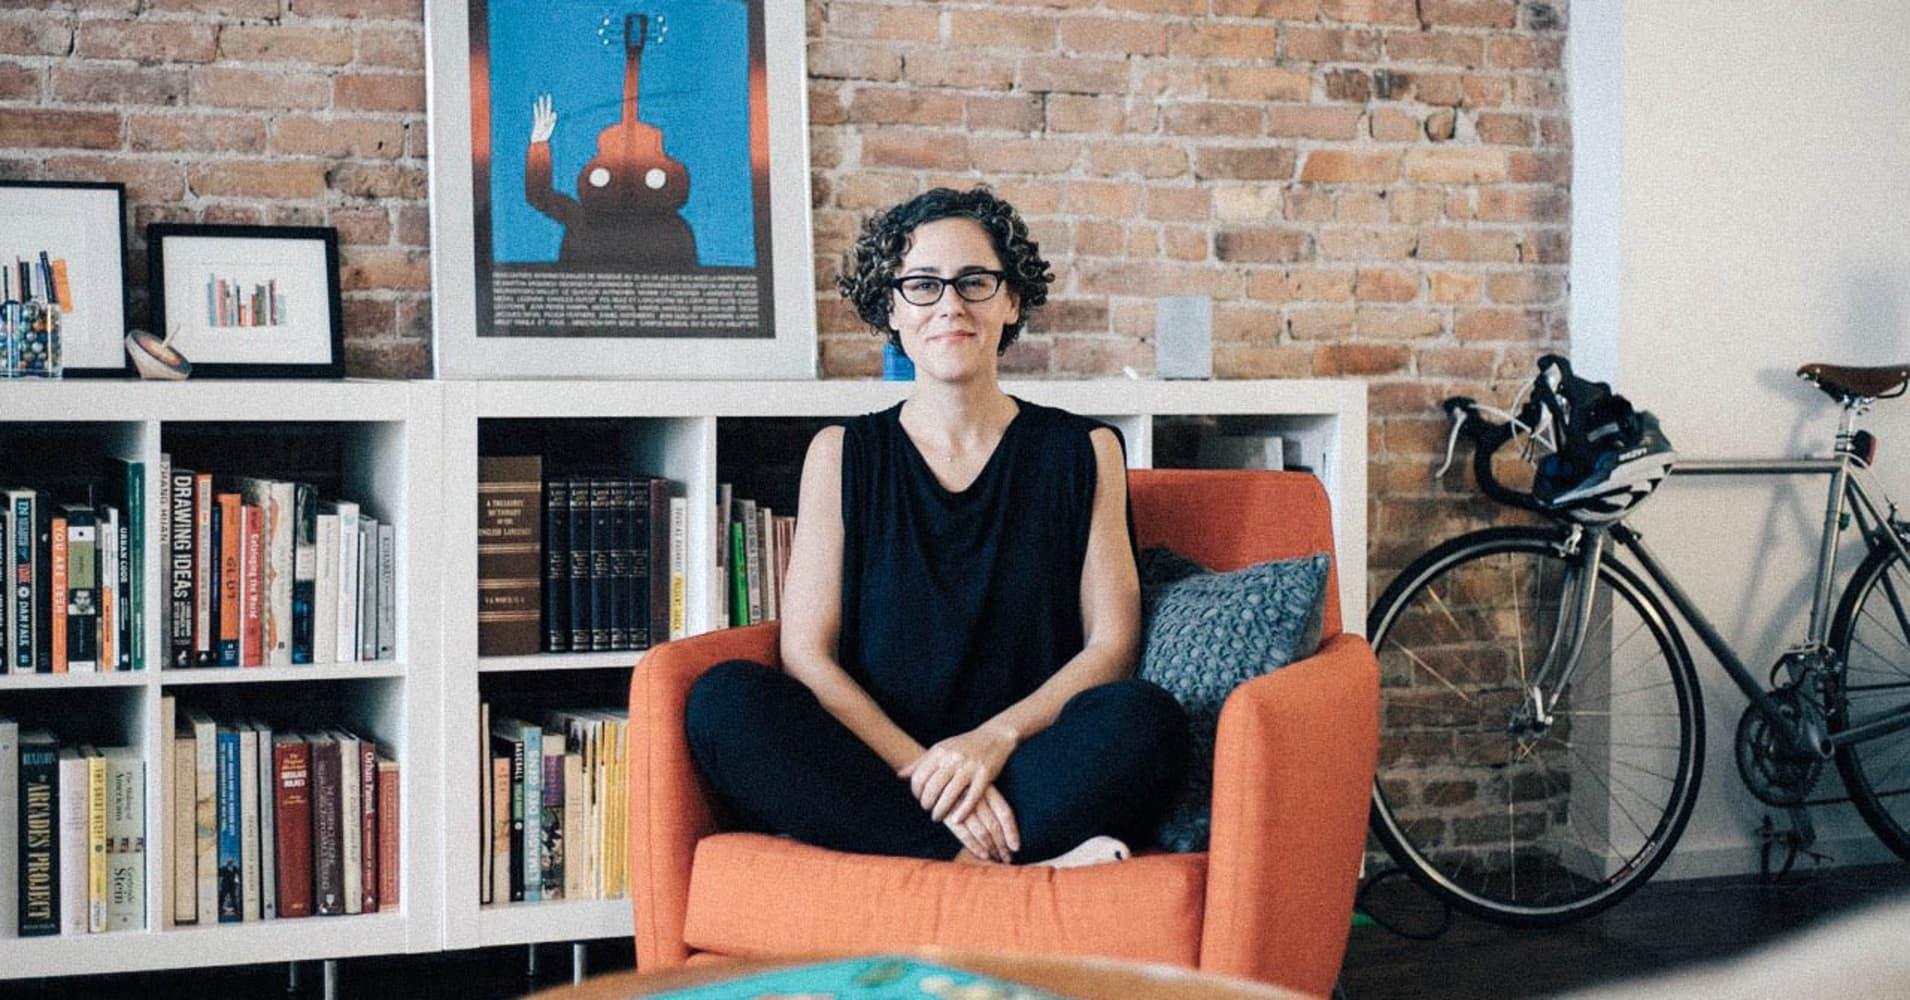 Liz Danzico, NPR's first creative director and co-founder of the School of Visual Arts' MFA program in interaction design.